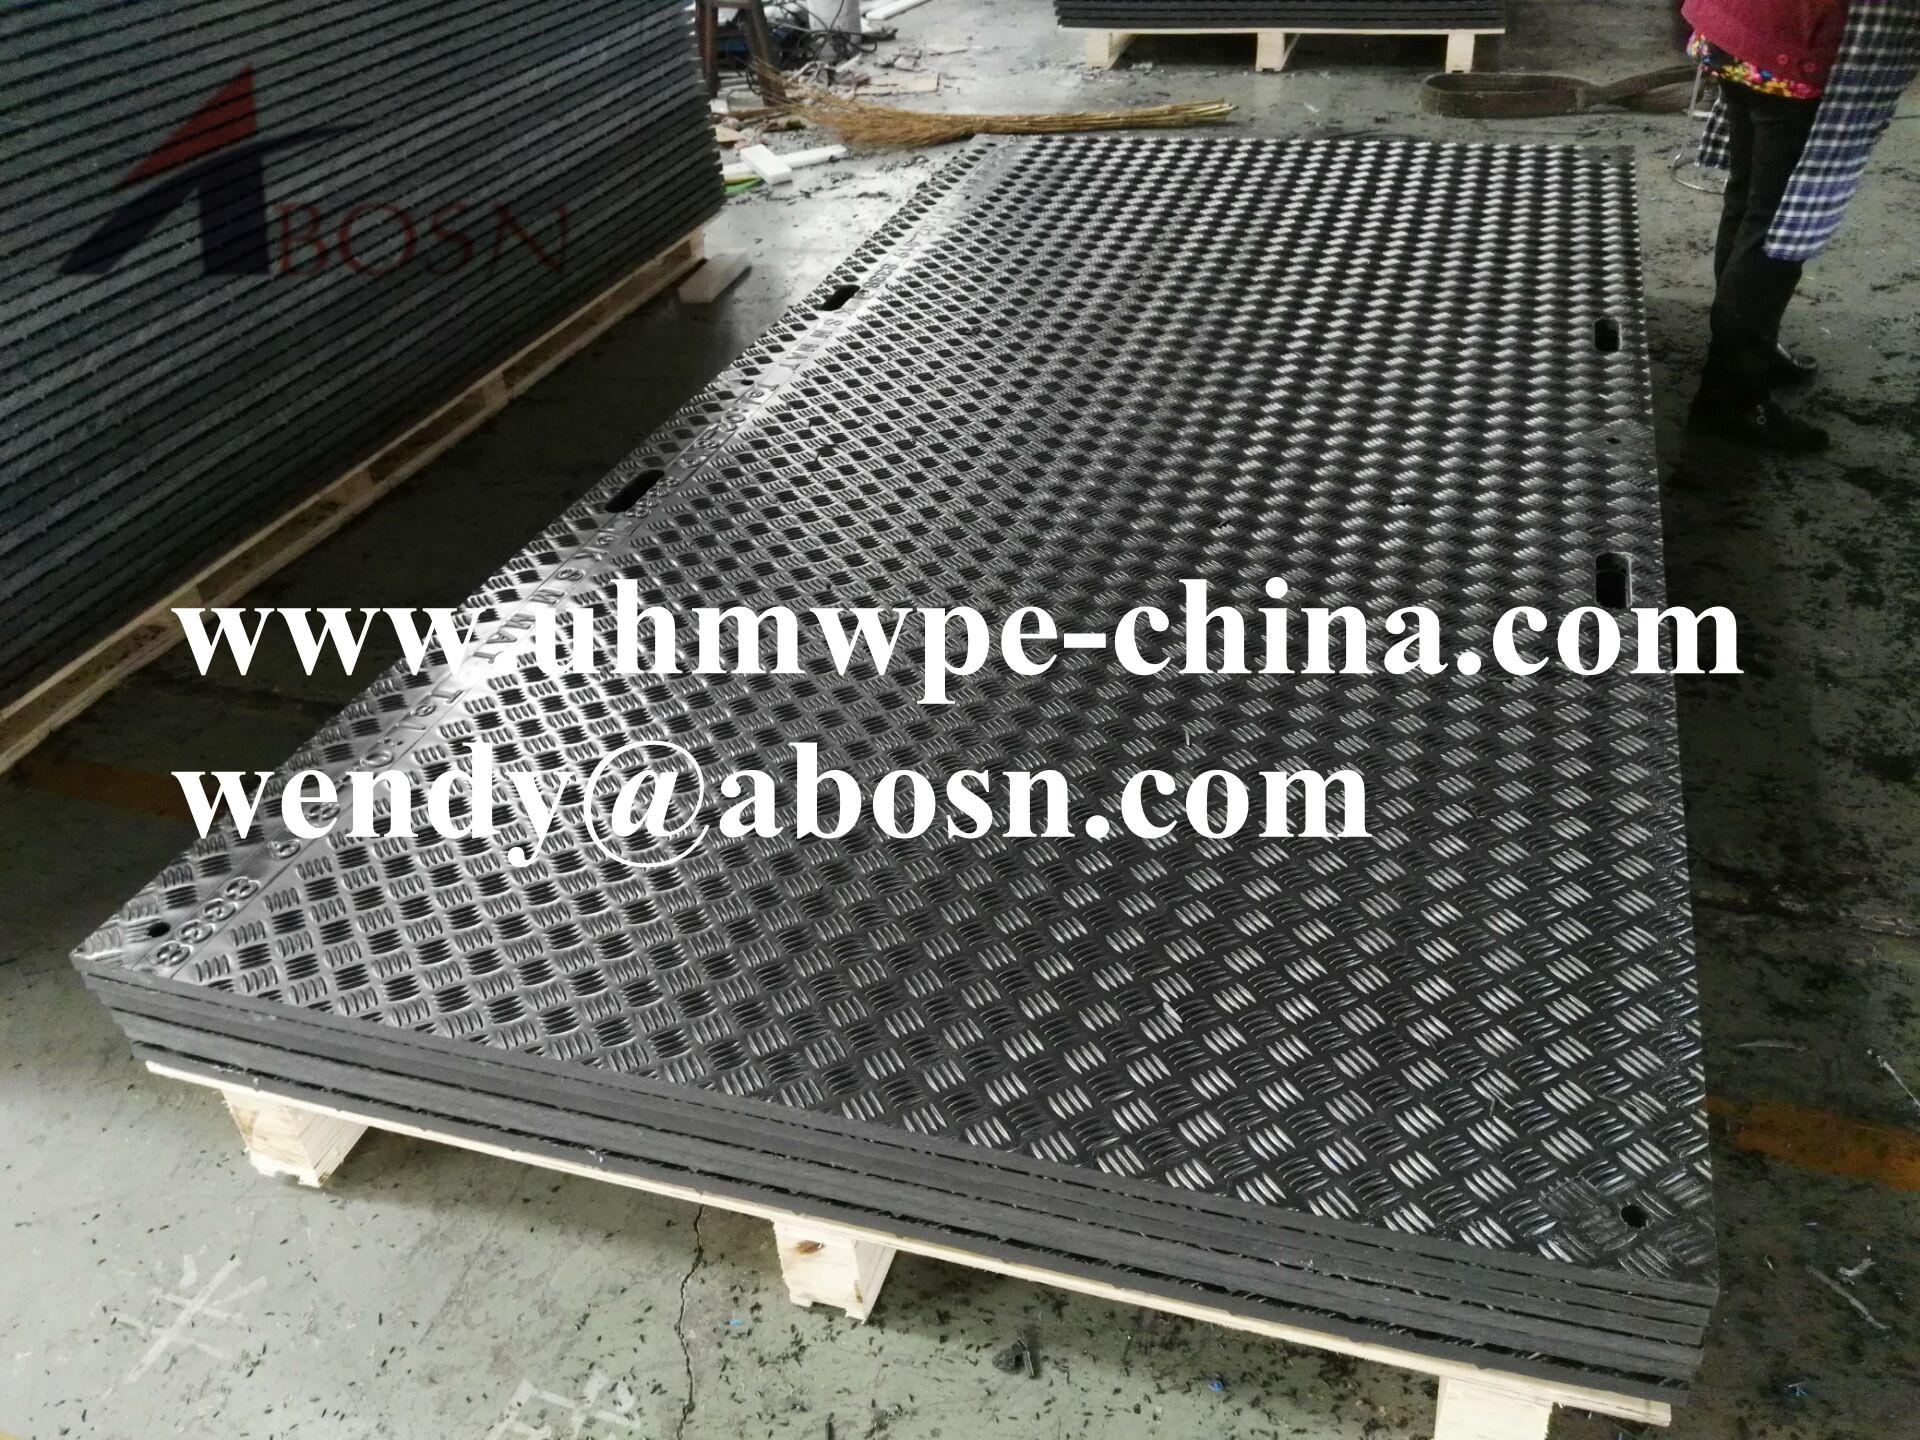 High Density Polyethylene Flooring Mat for Pathway